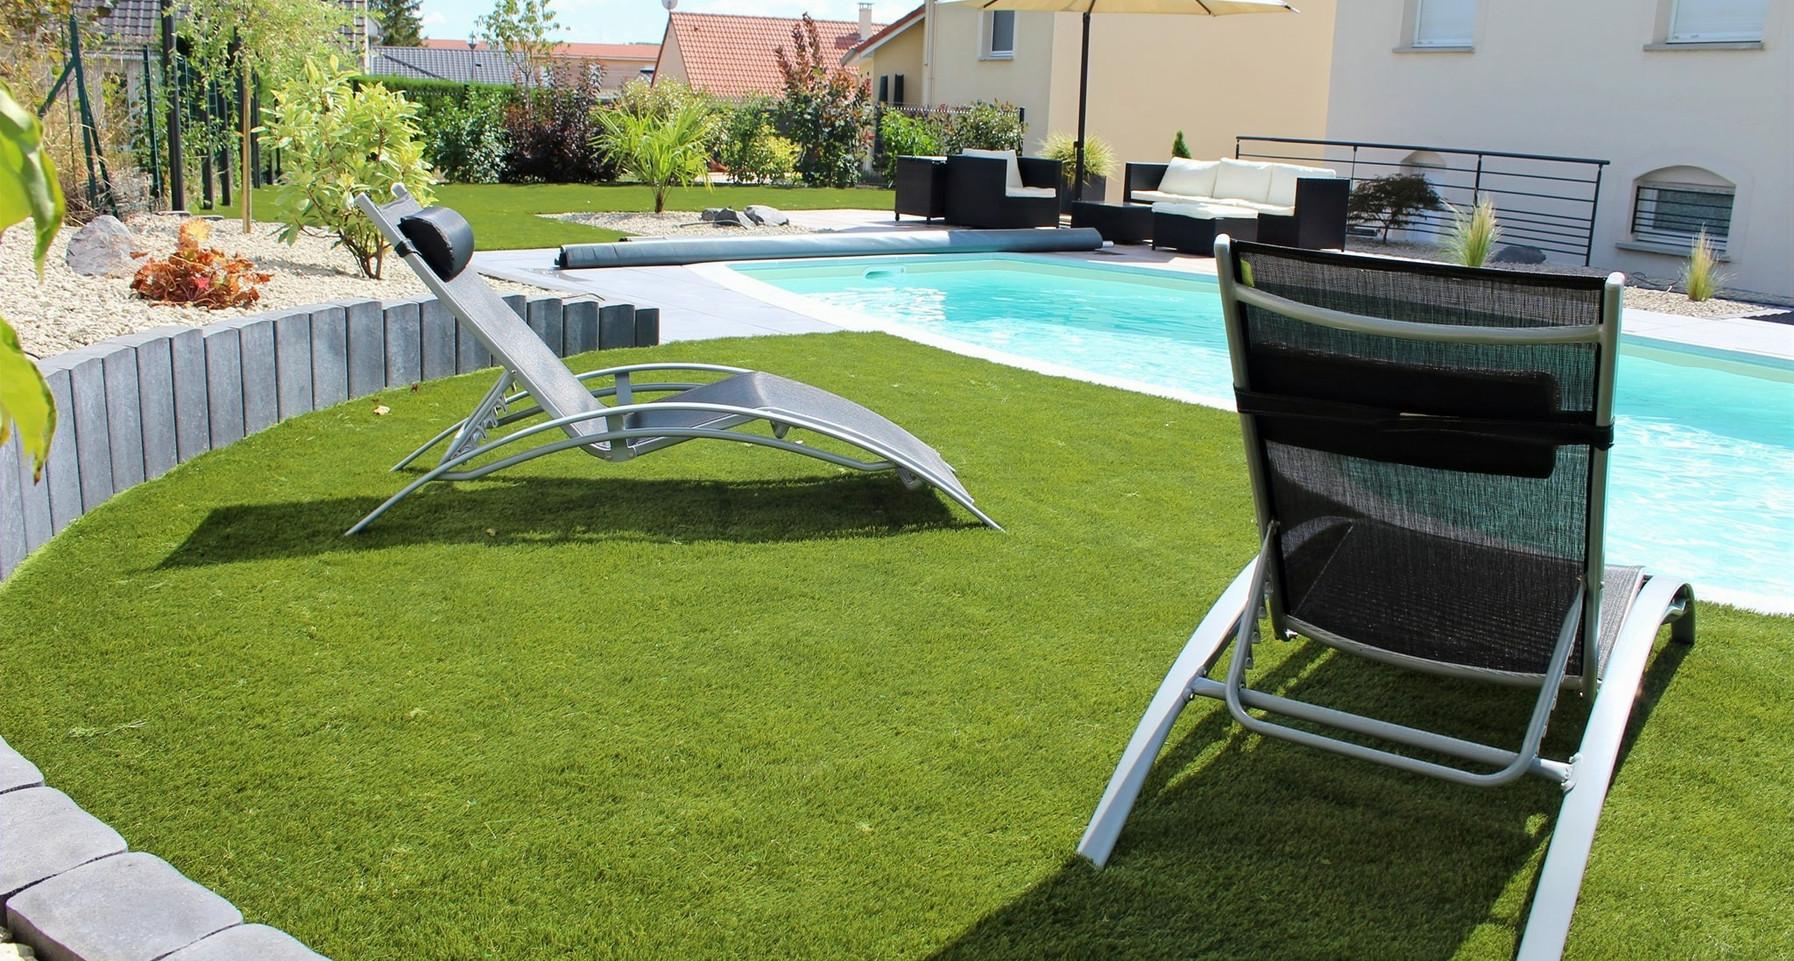 palissade-piscine-gazon-qualite-paysage_